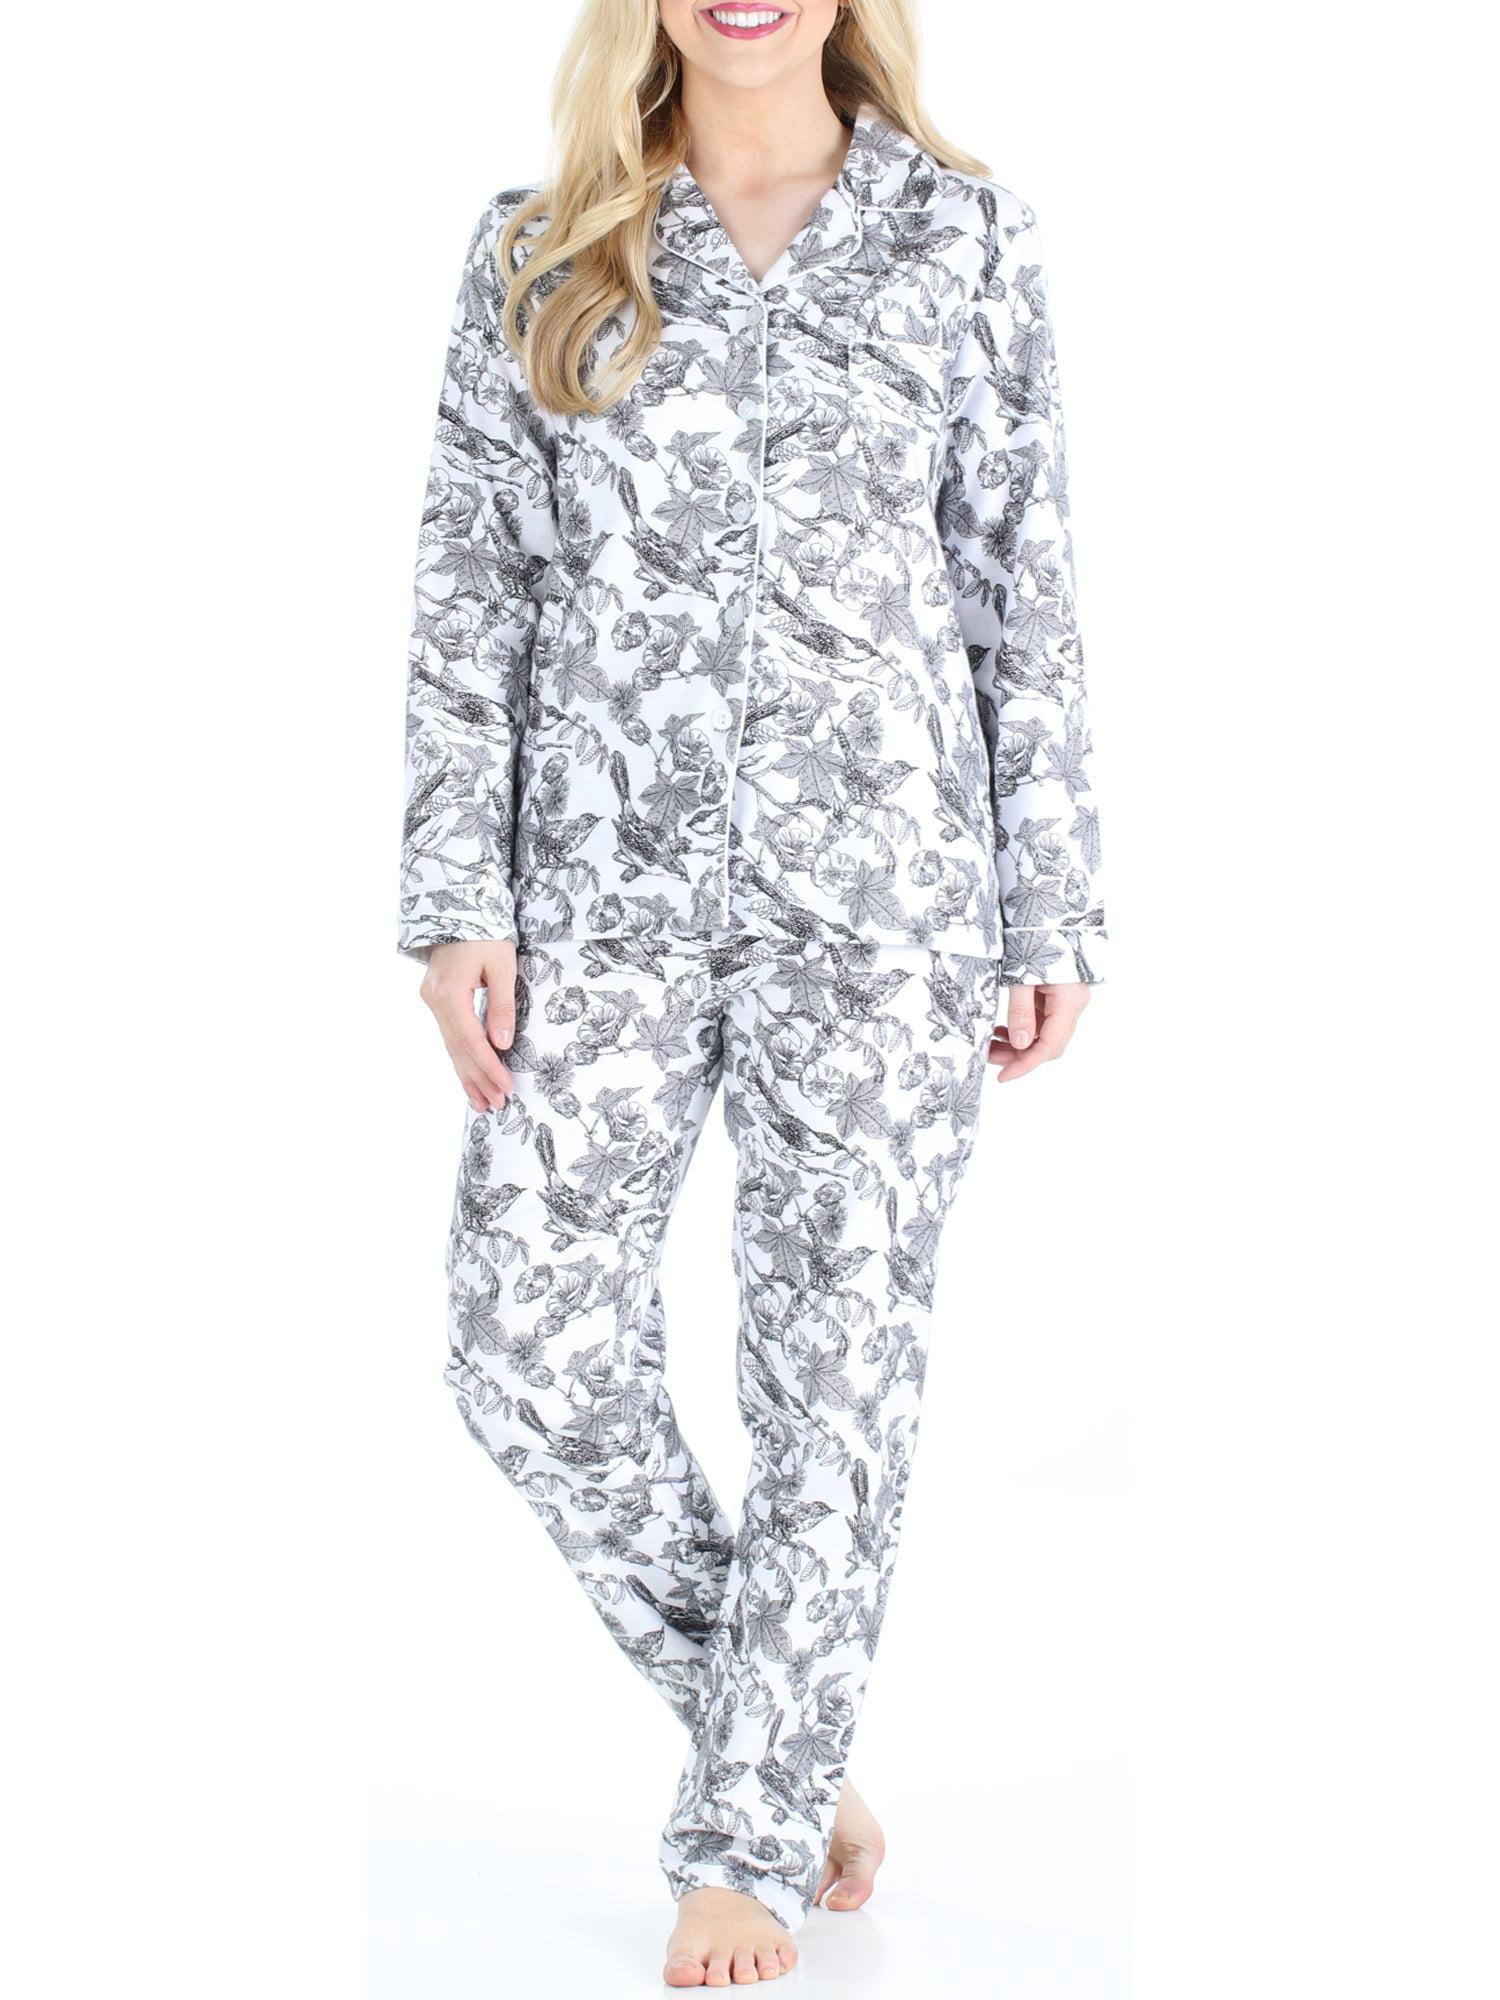 Ladies womans cotton Love pyjama pyjamas presentation pack Size 20 birthday gift